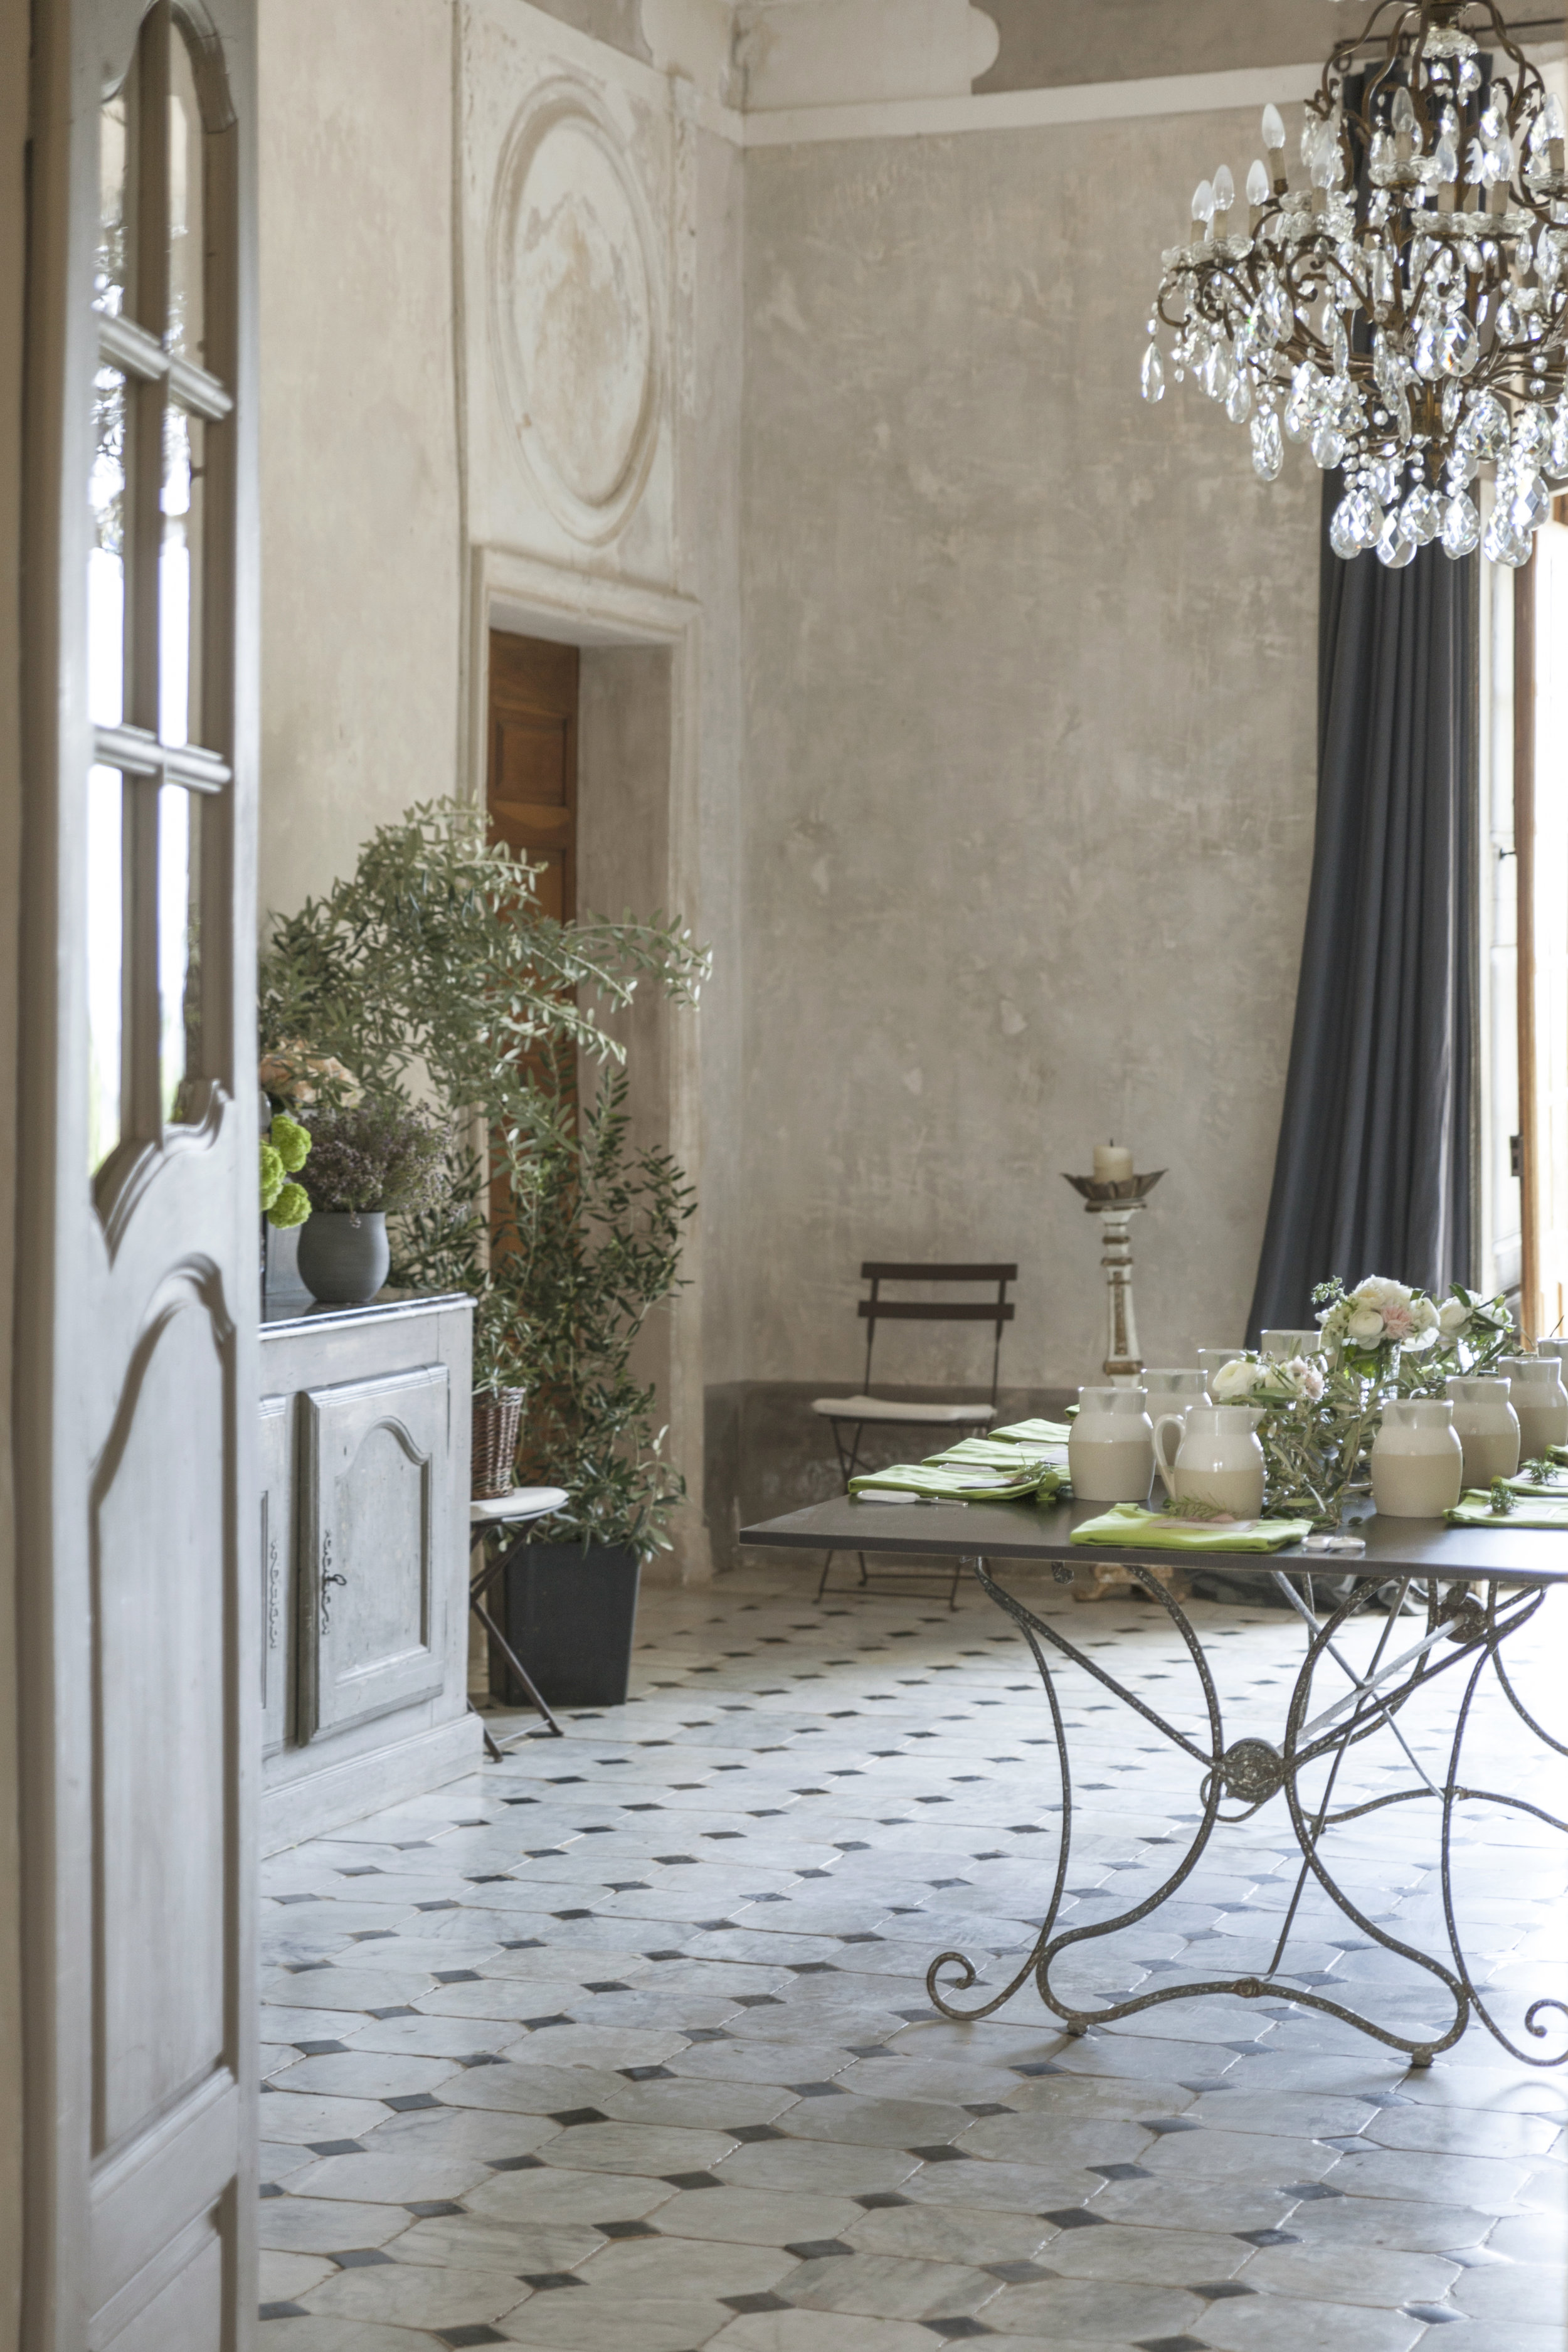 france travel chateau tour sandra sigman sharon santoni flower design workshop lesfleurs